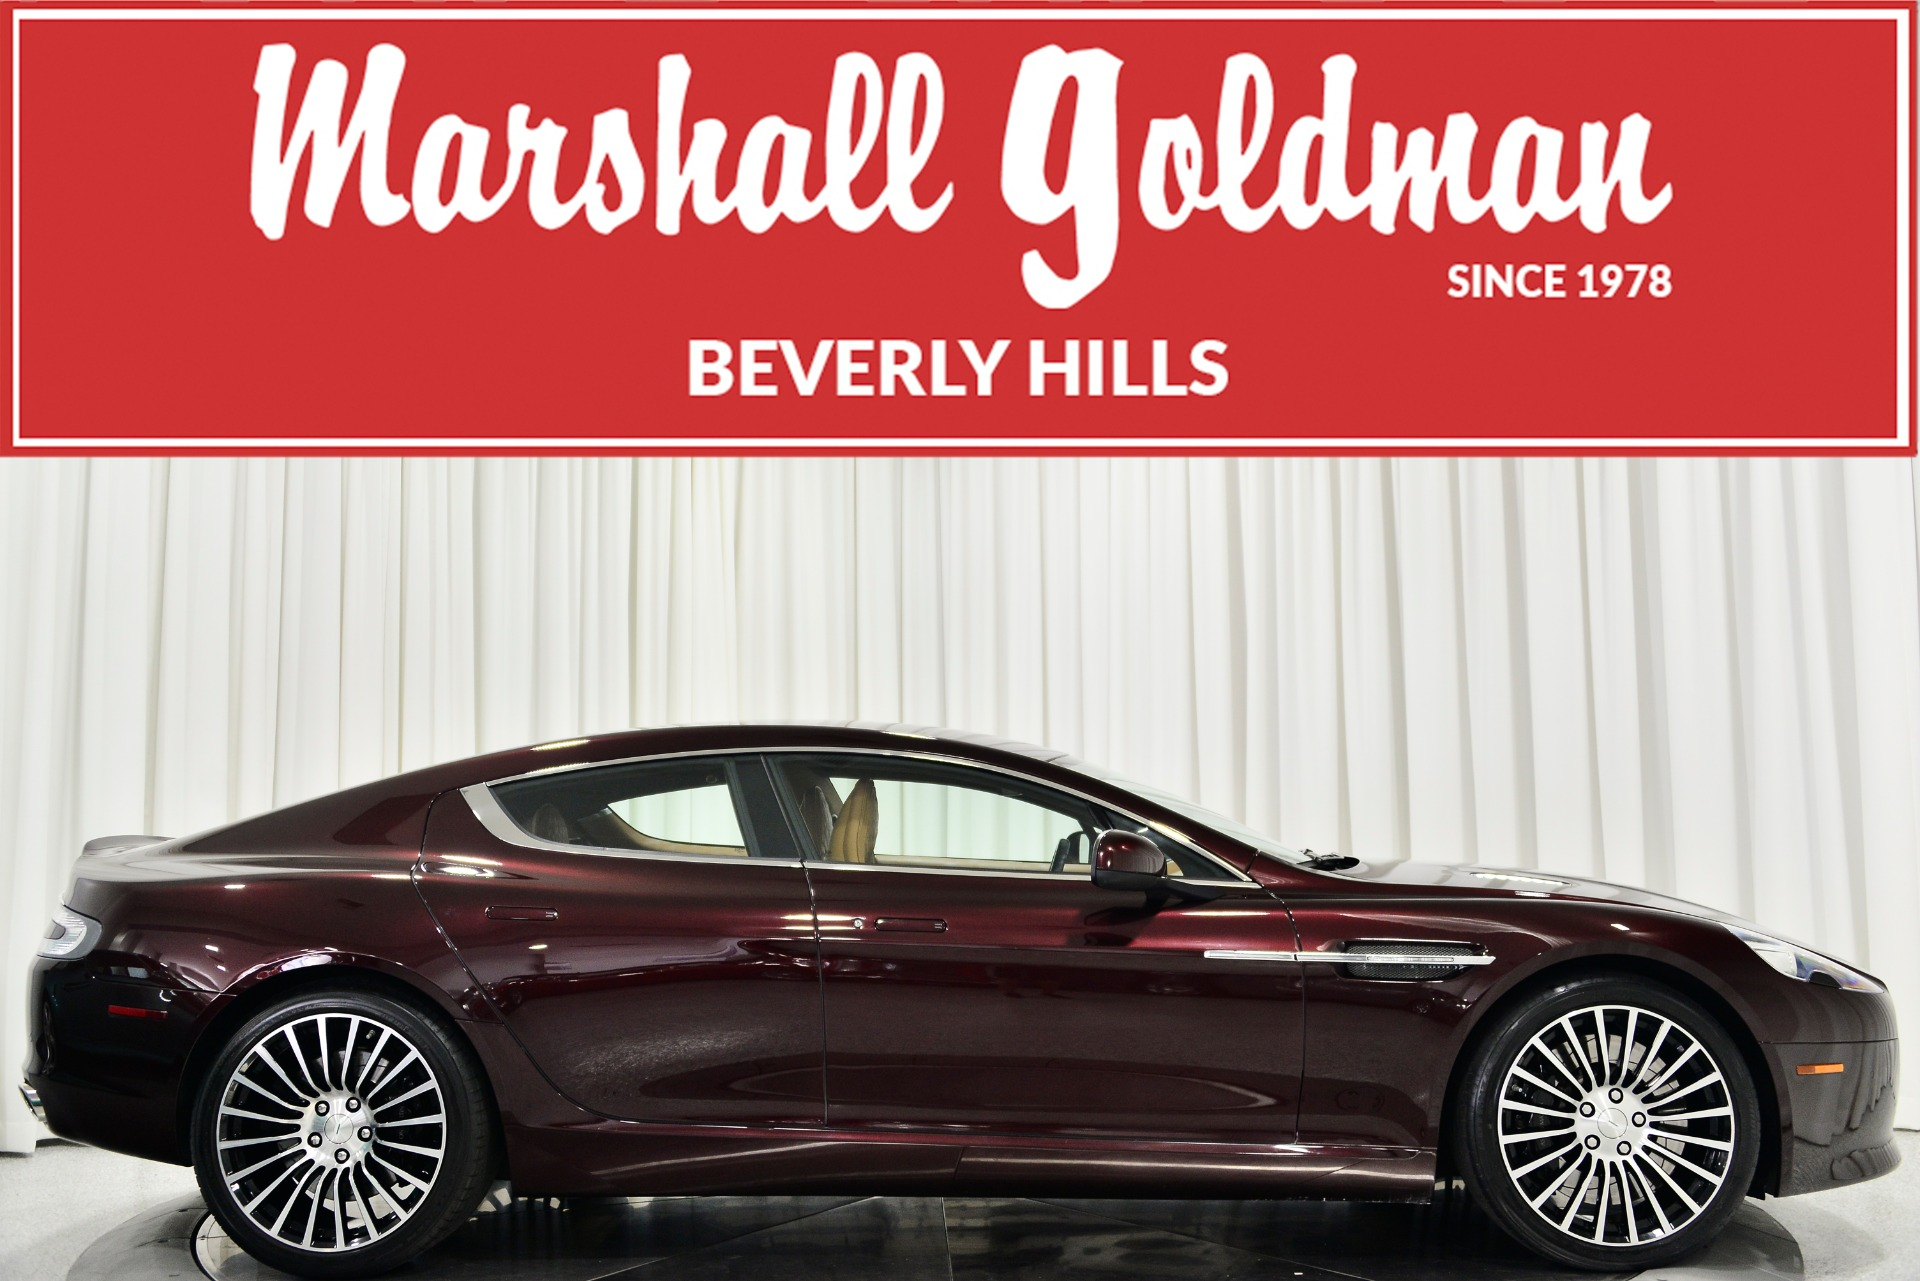 Used 2016 Aston Martin Rapide S For Sale Sold Marshall Goldman Motor Sales Stock B21138